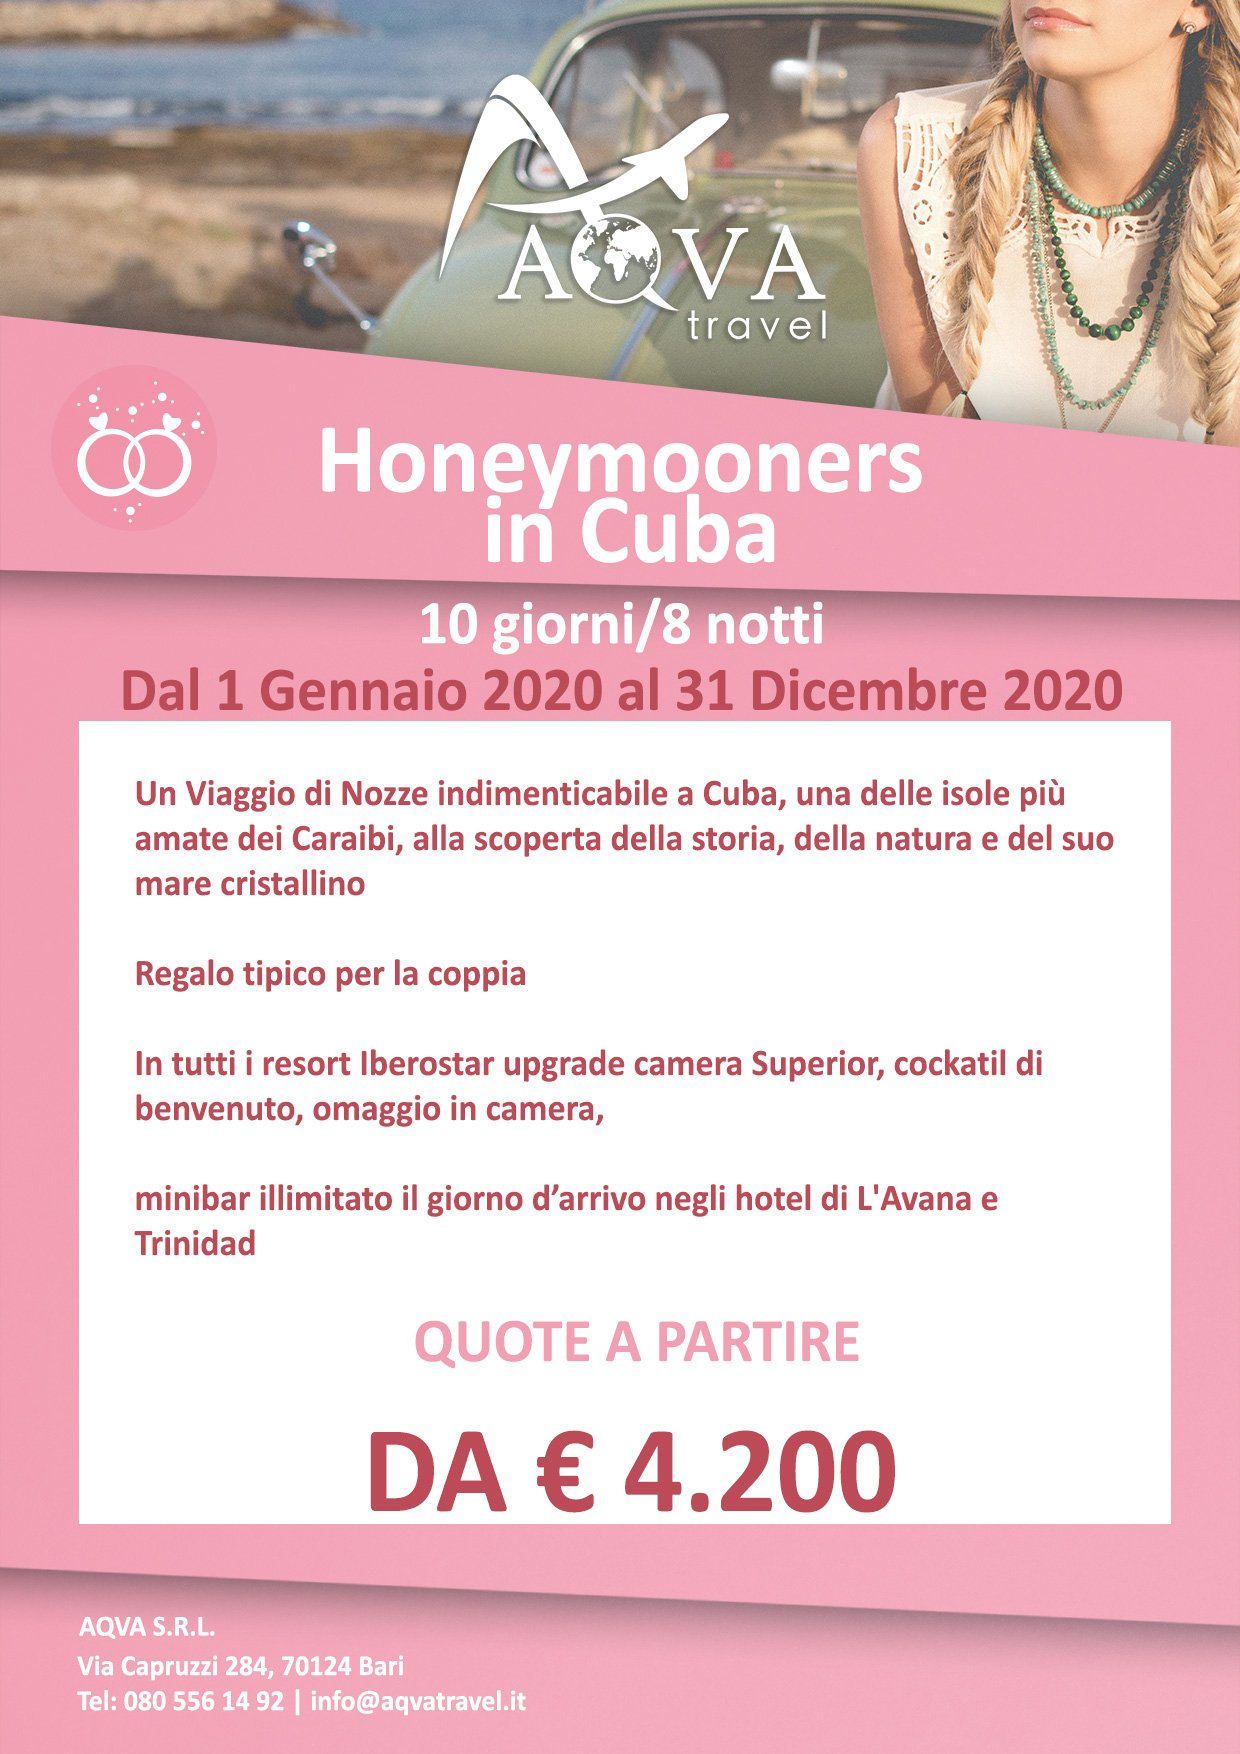 Honeymooners-in-Cuba-VIAGGI-DI-NOZZE-offerte-agenzia-di-viaggi-Bari-AQVATRAVEL-it